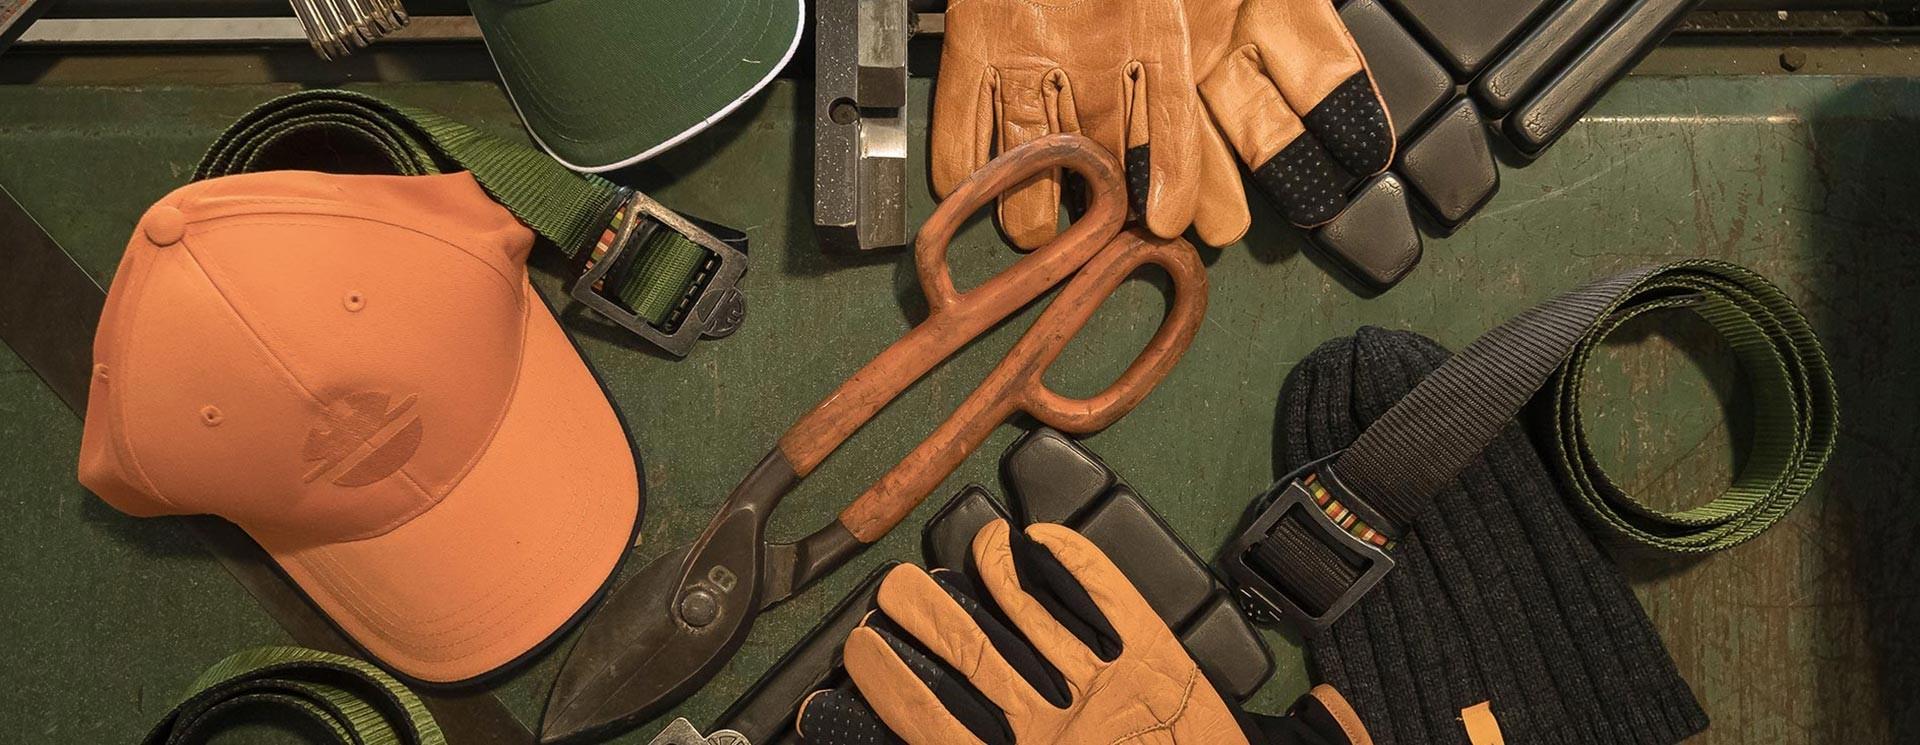 Accessories - Workwear | Dike